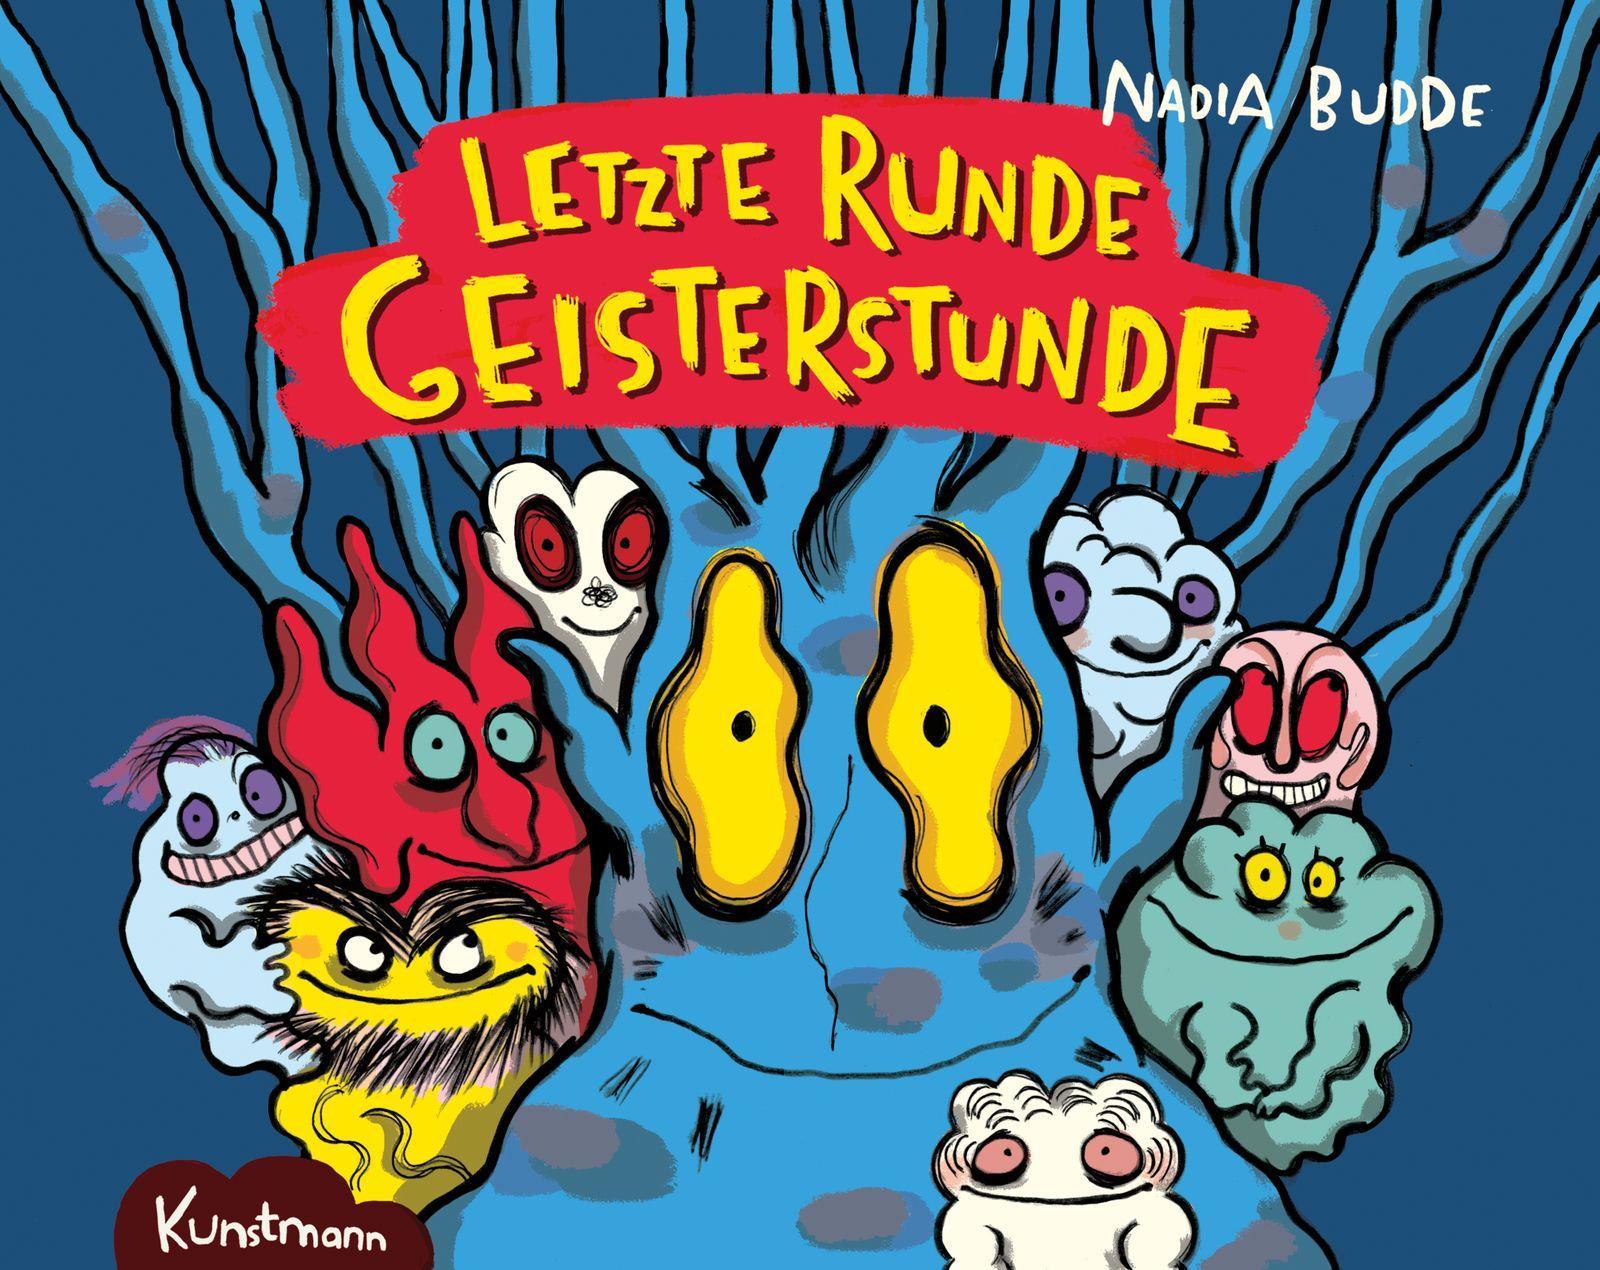 Kinderbücher/ Nadia Budde: Letzte Runde - Geisterstunde COVER